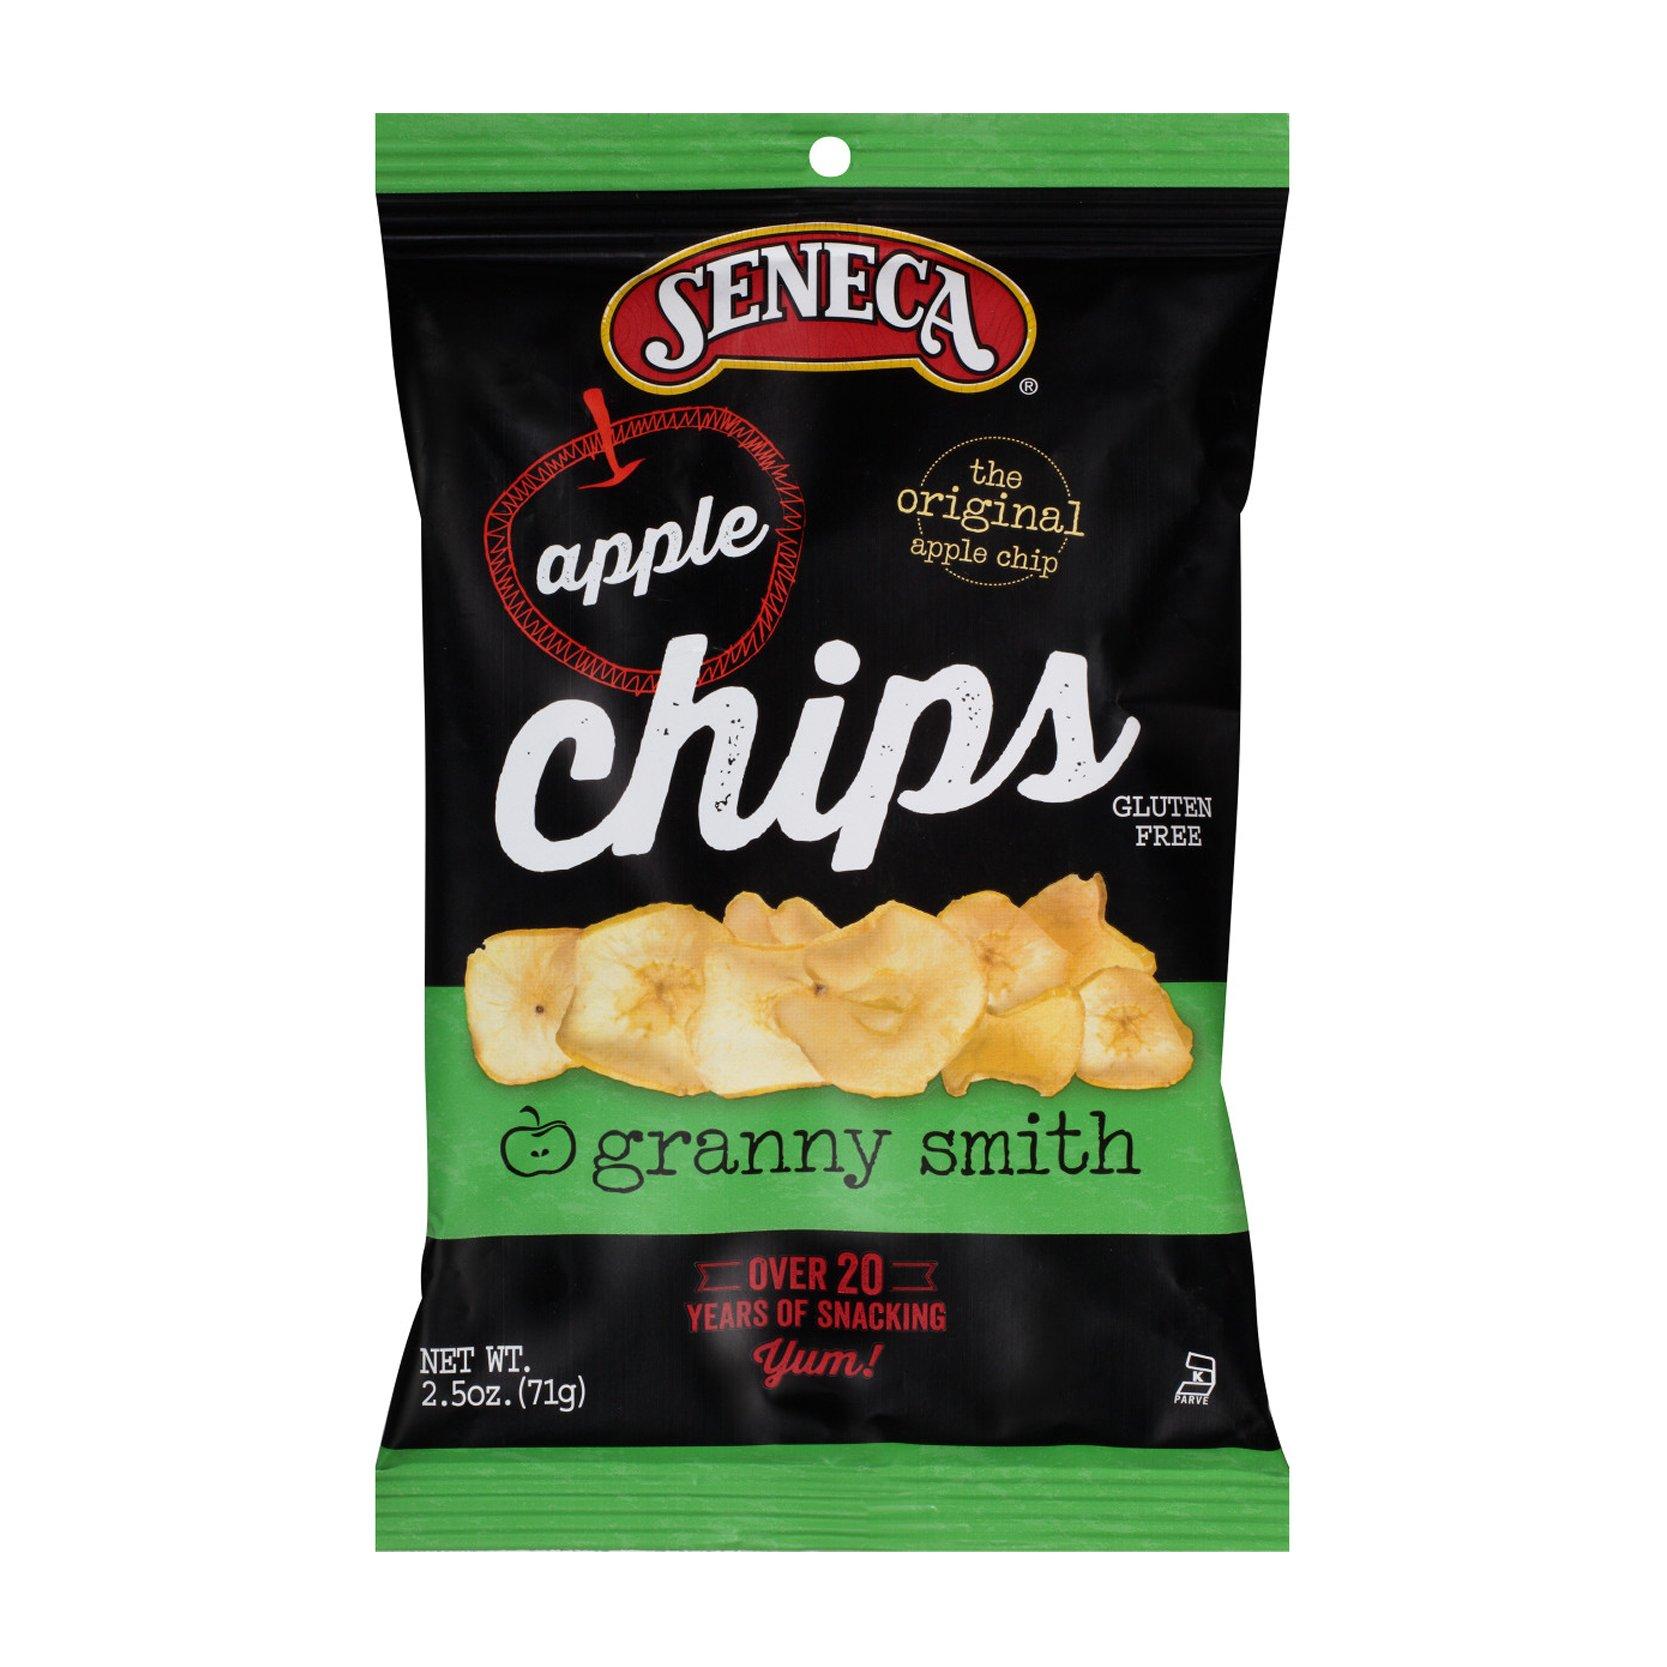 Seneca Crispy Apple Chips, Granny Smith, 2.5 Ounce (Pack of 12)